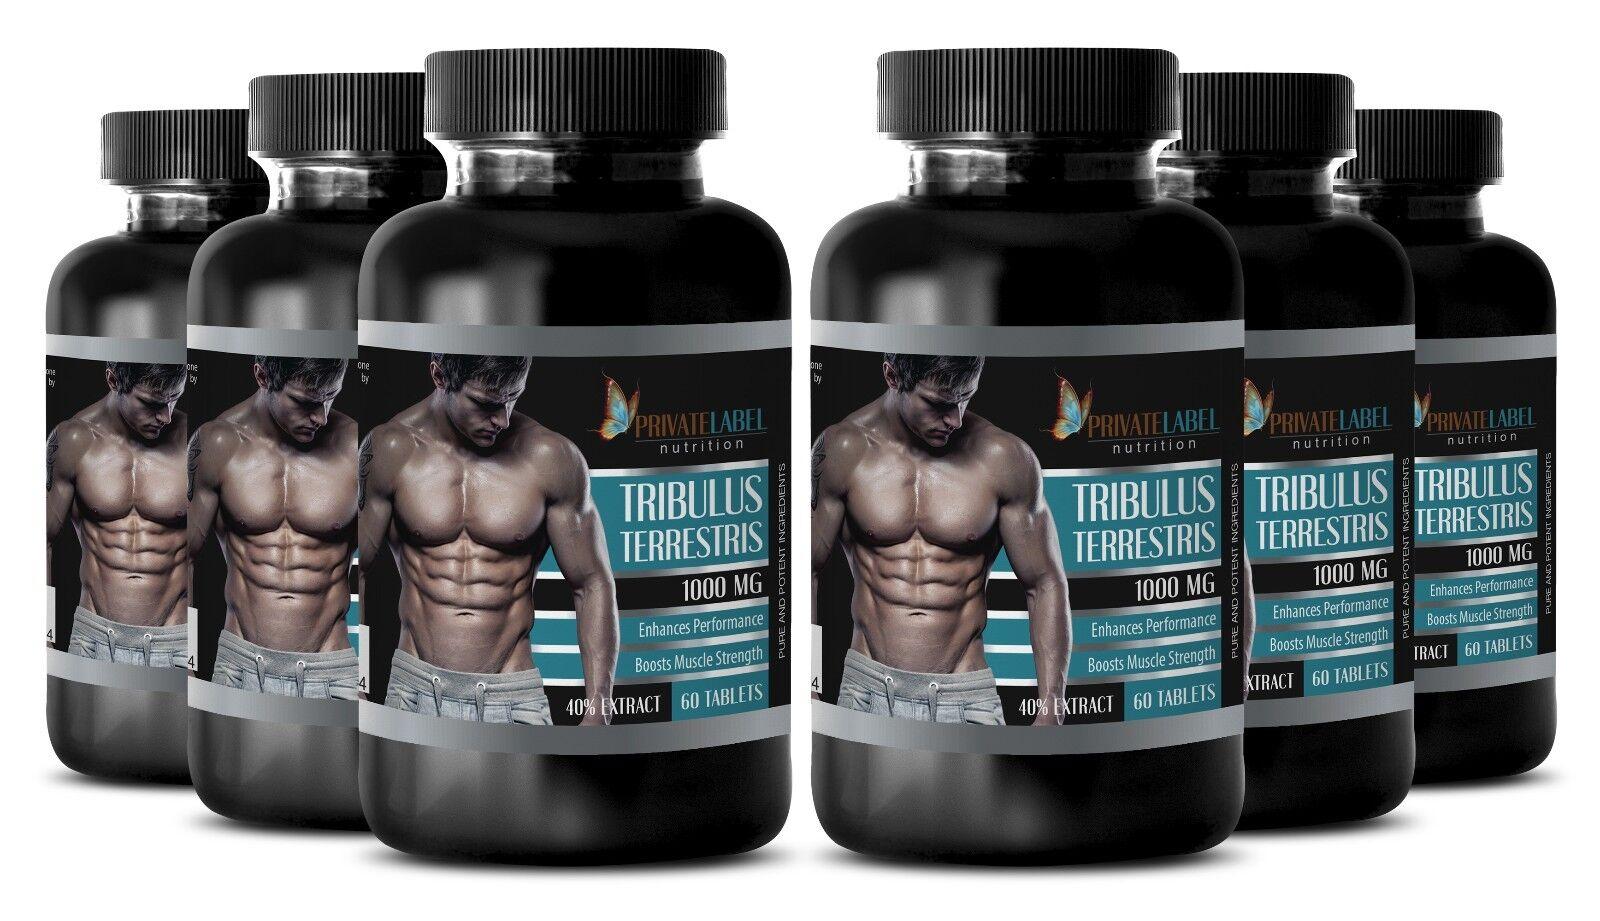 tribulus terrestris powder 1000mg testosterone booster male enhancer